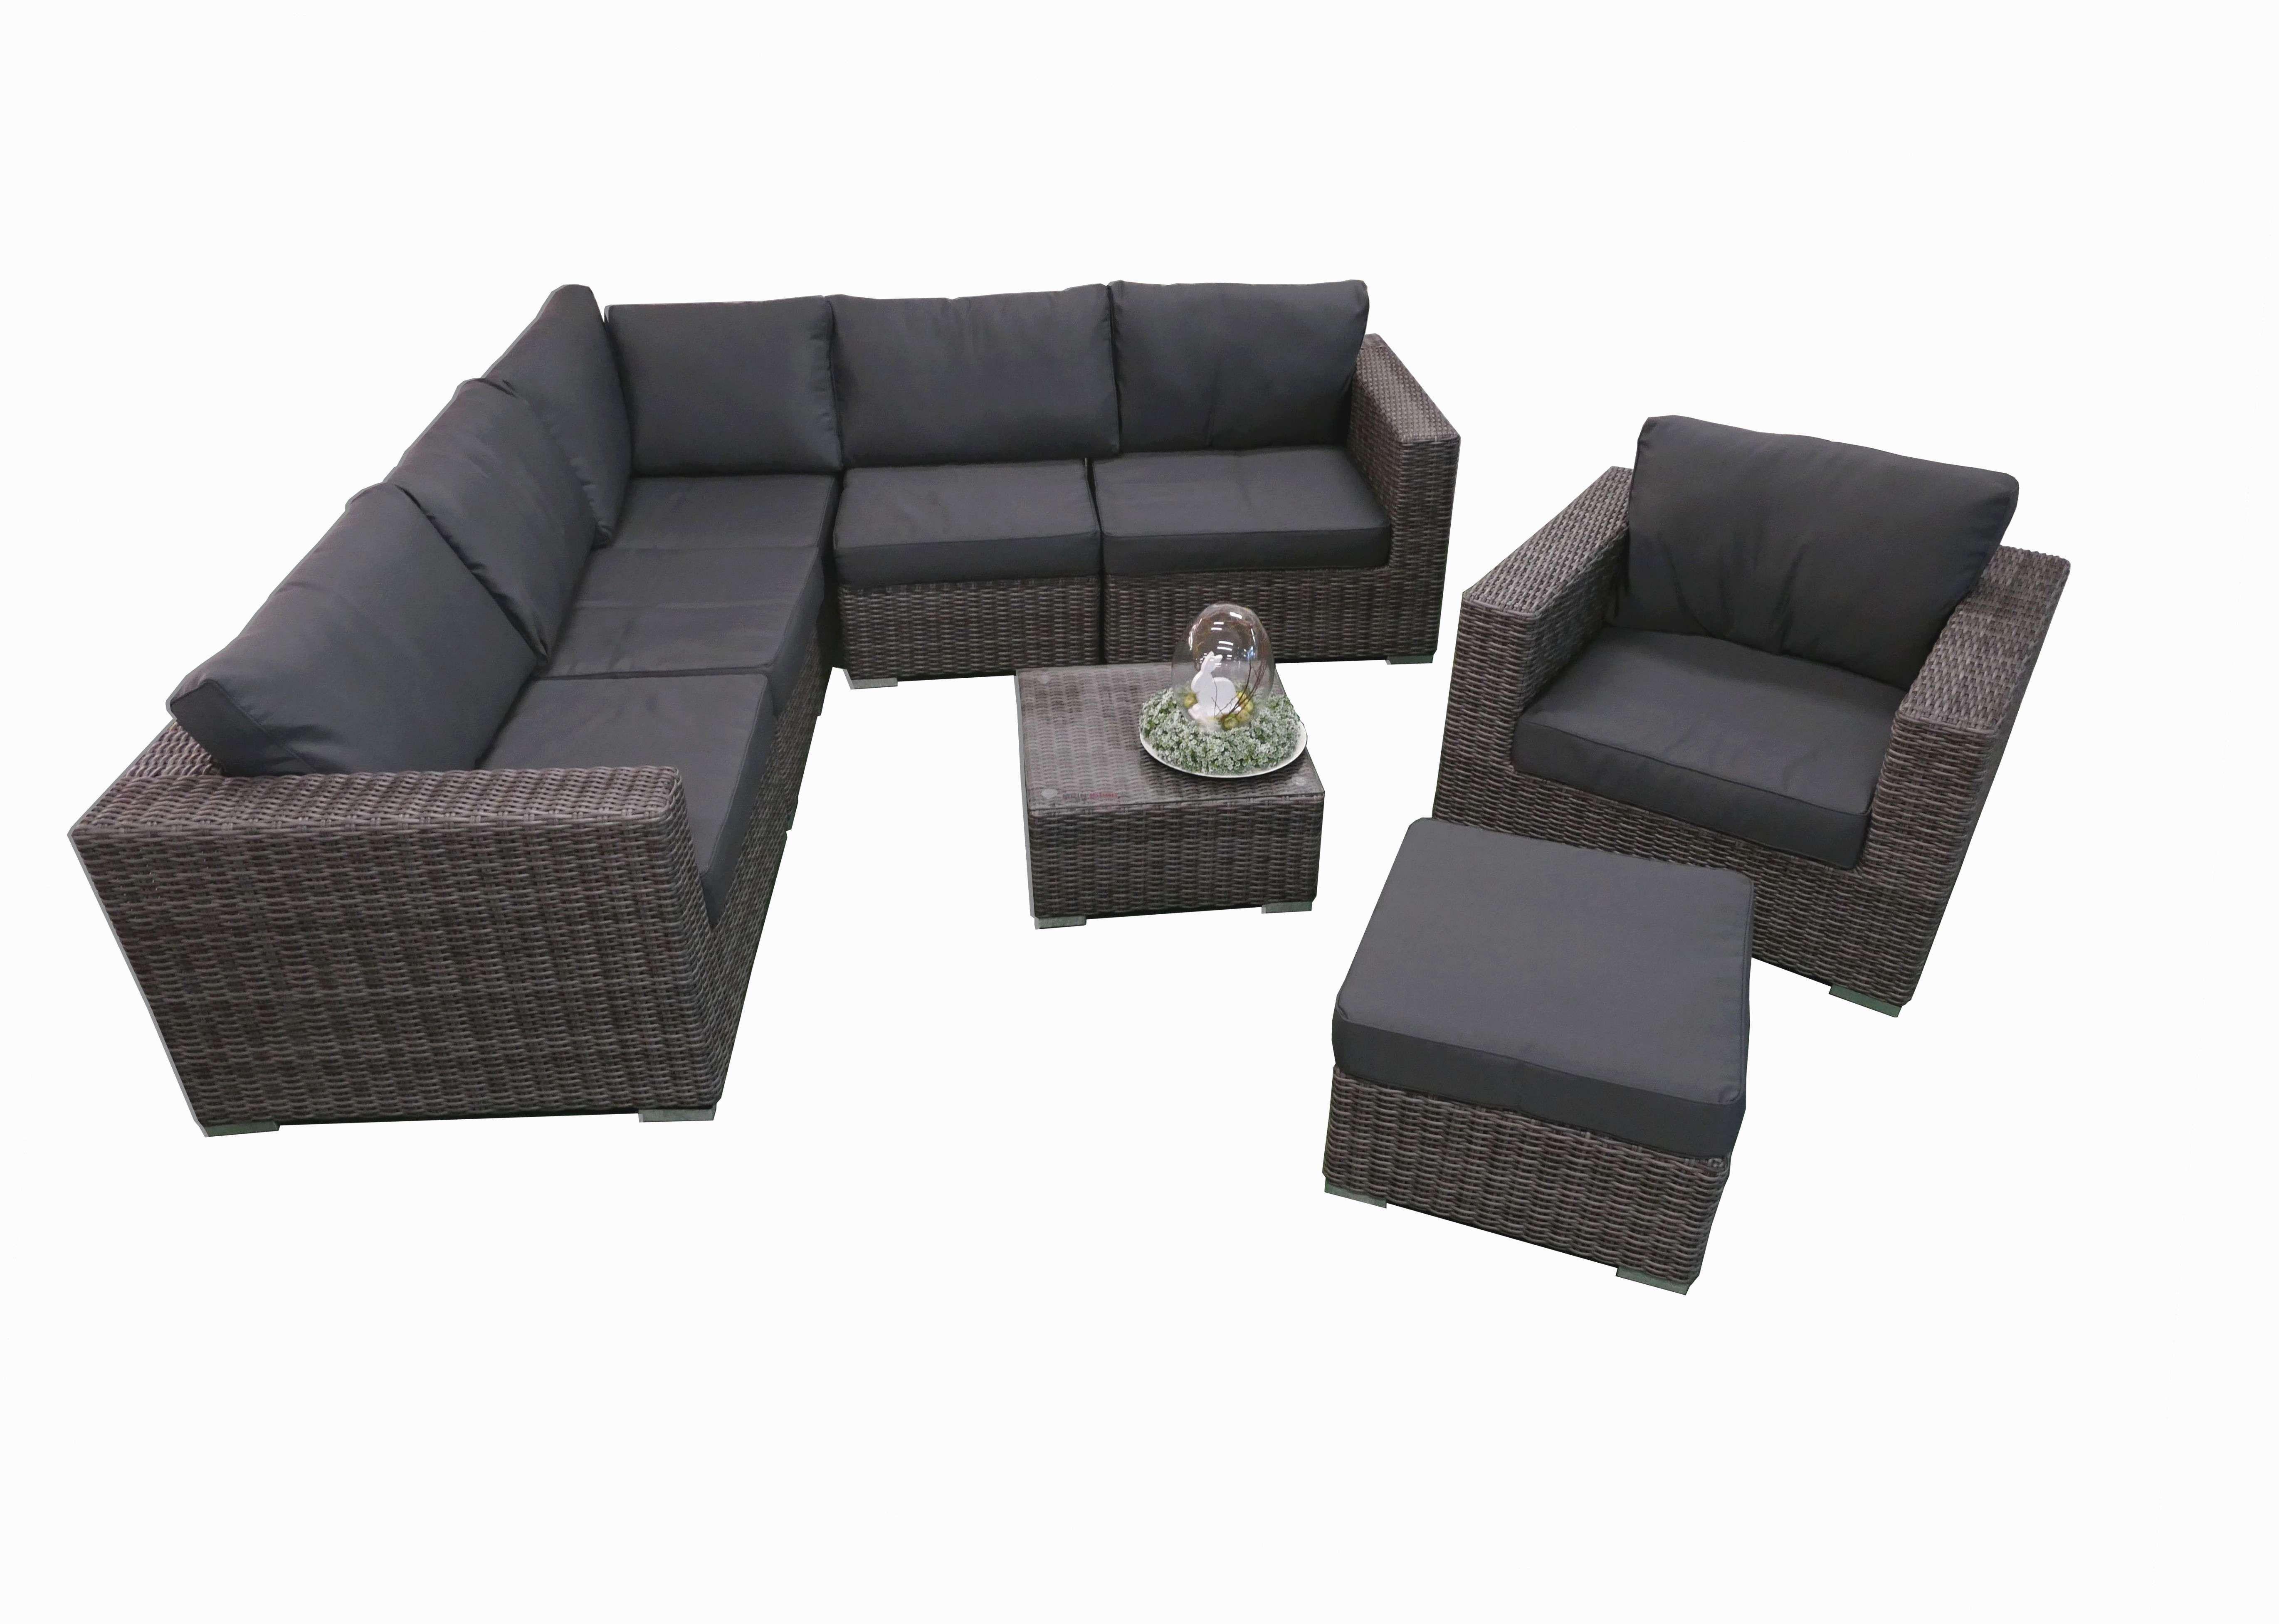 29 Inspirierende Outdoor Sofa Mit Baldachin Sofa Leather Sofa Set Top Grain Leather Sofa White Furniture Living Room